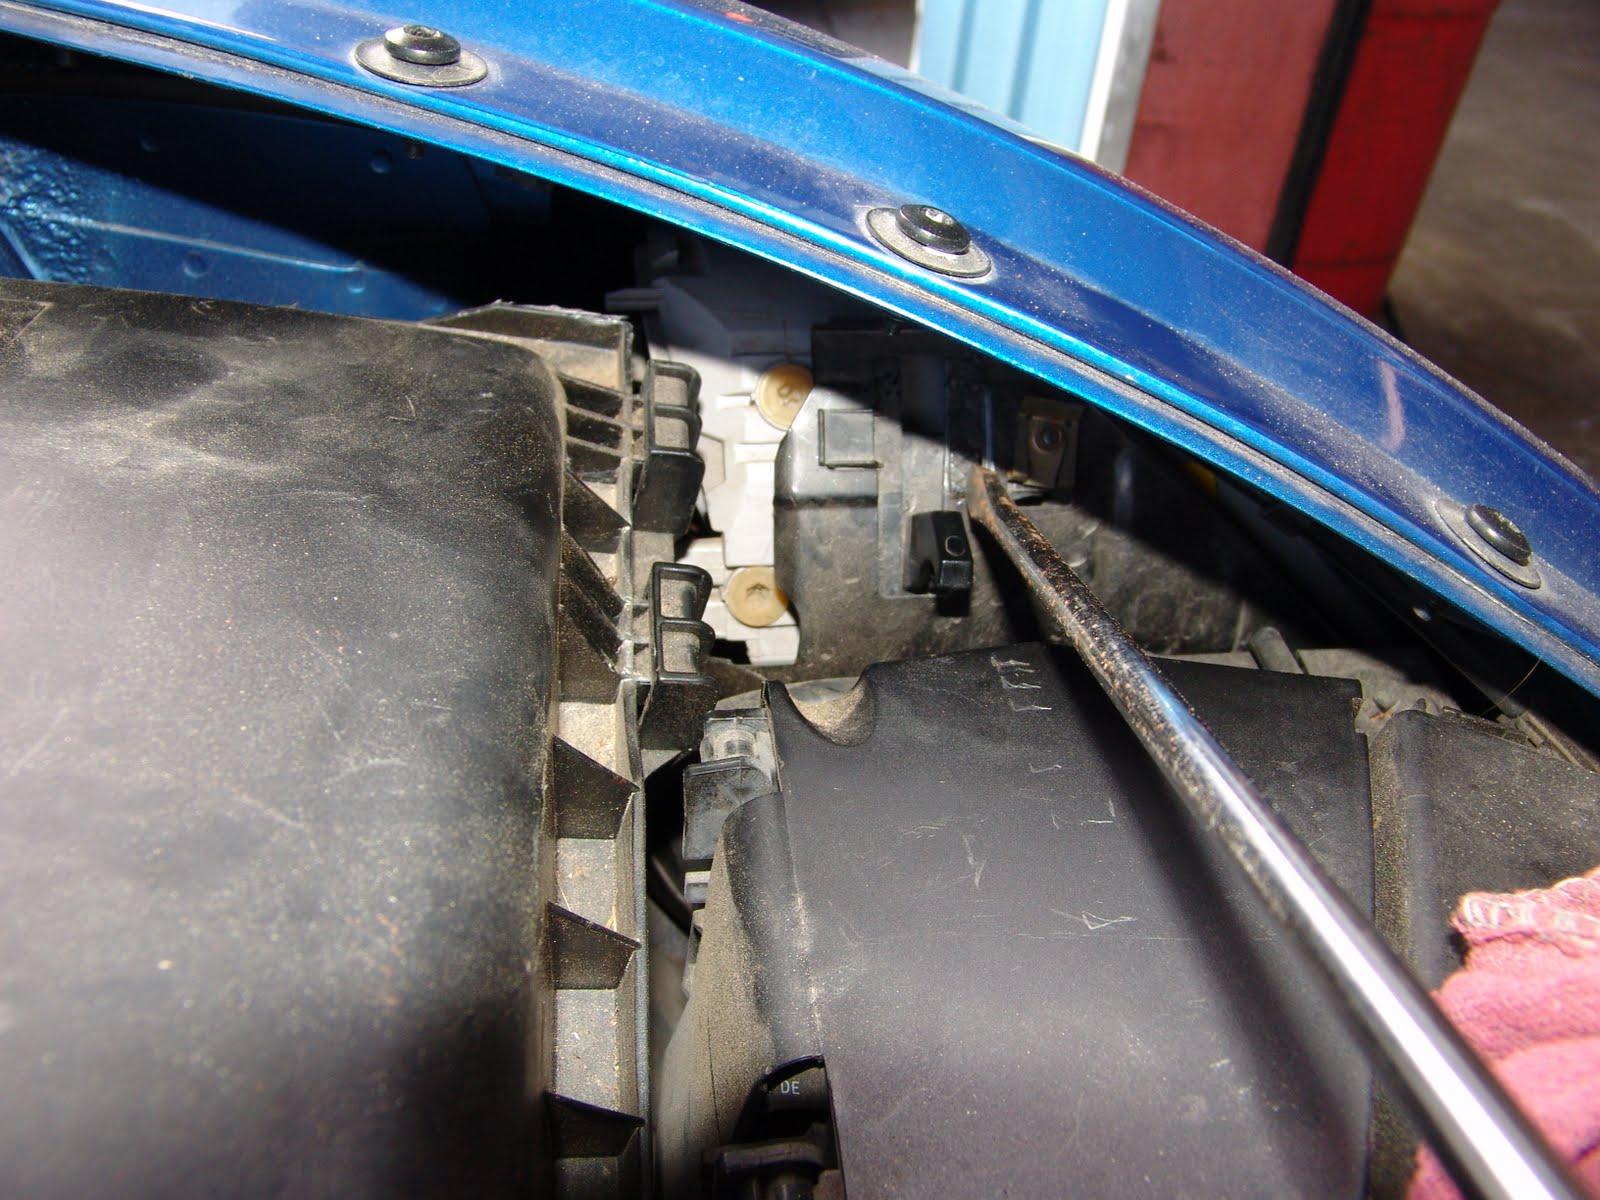 How Do I Replace The Headlight Bulb In A 2005 Buick Autos Weblog